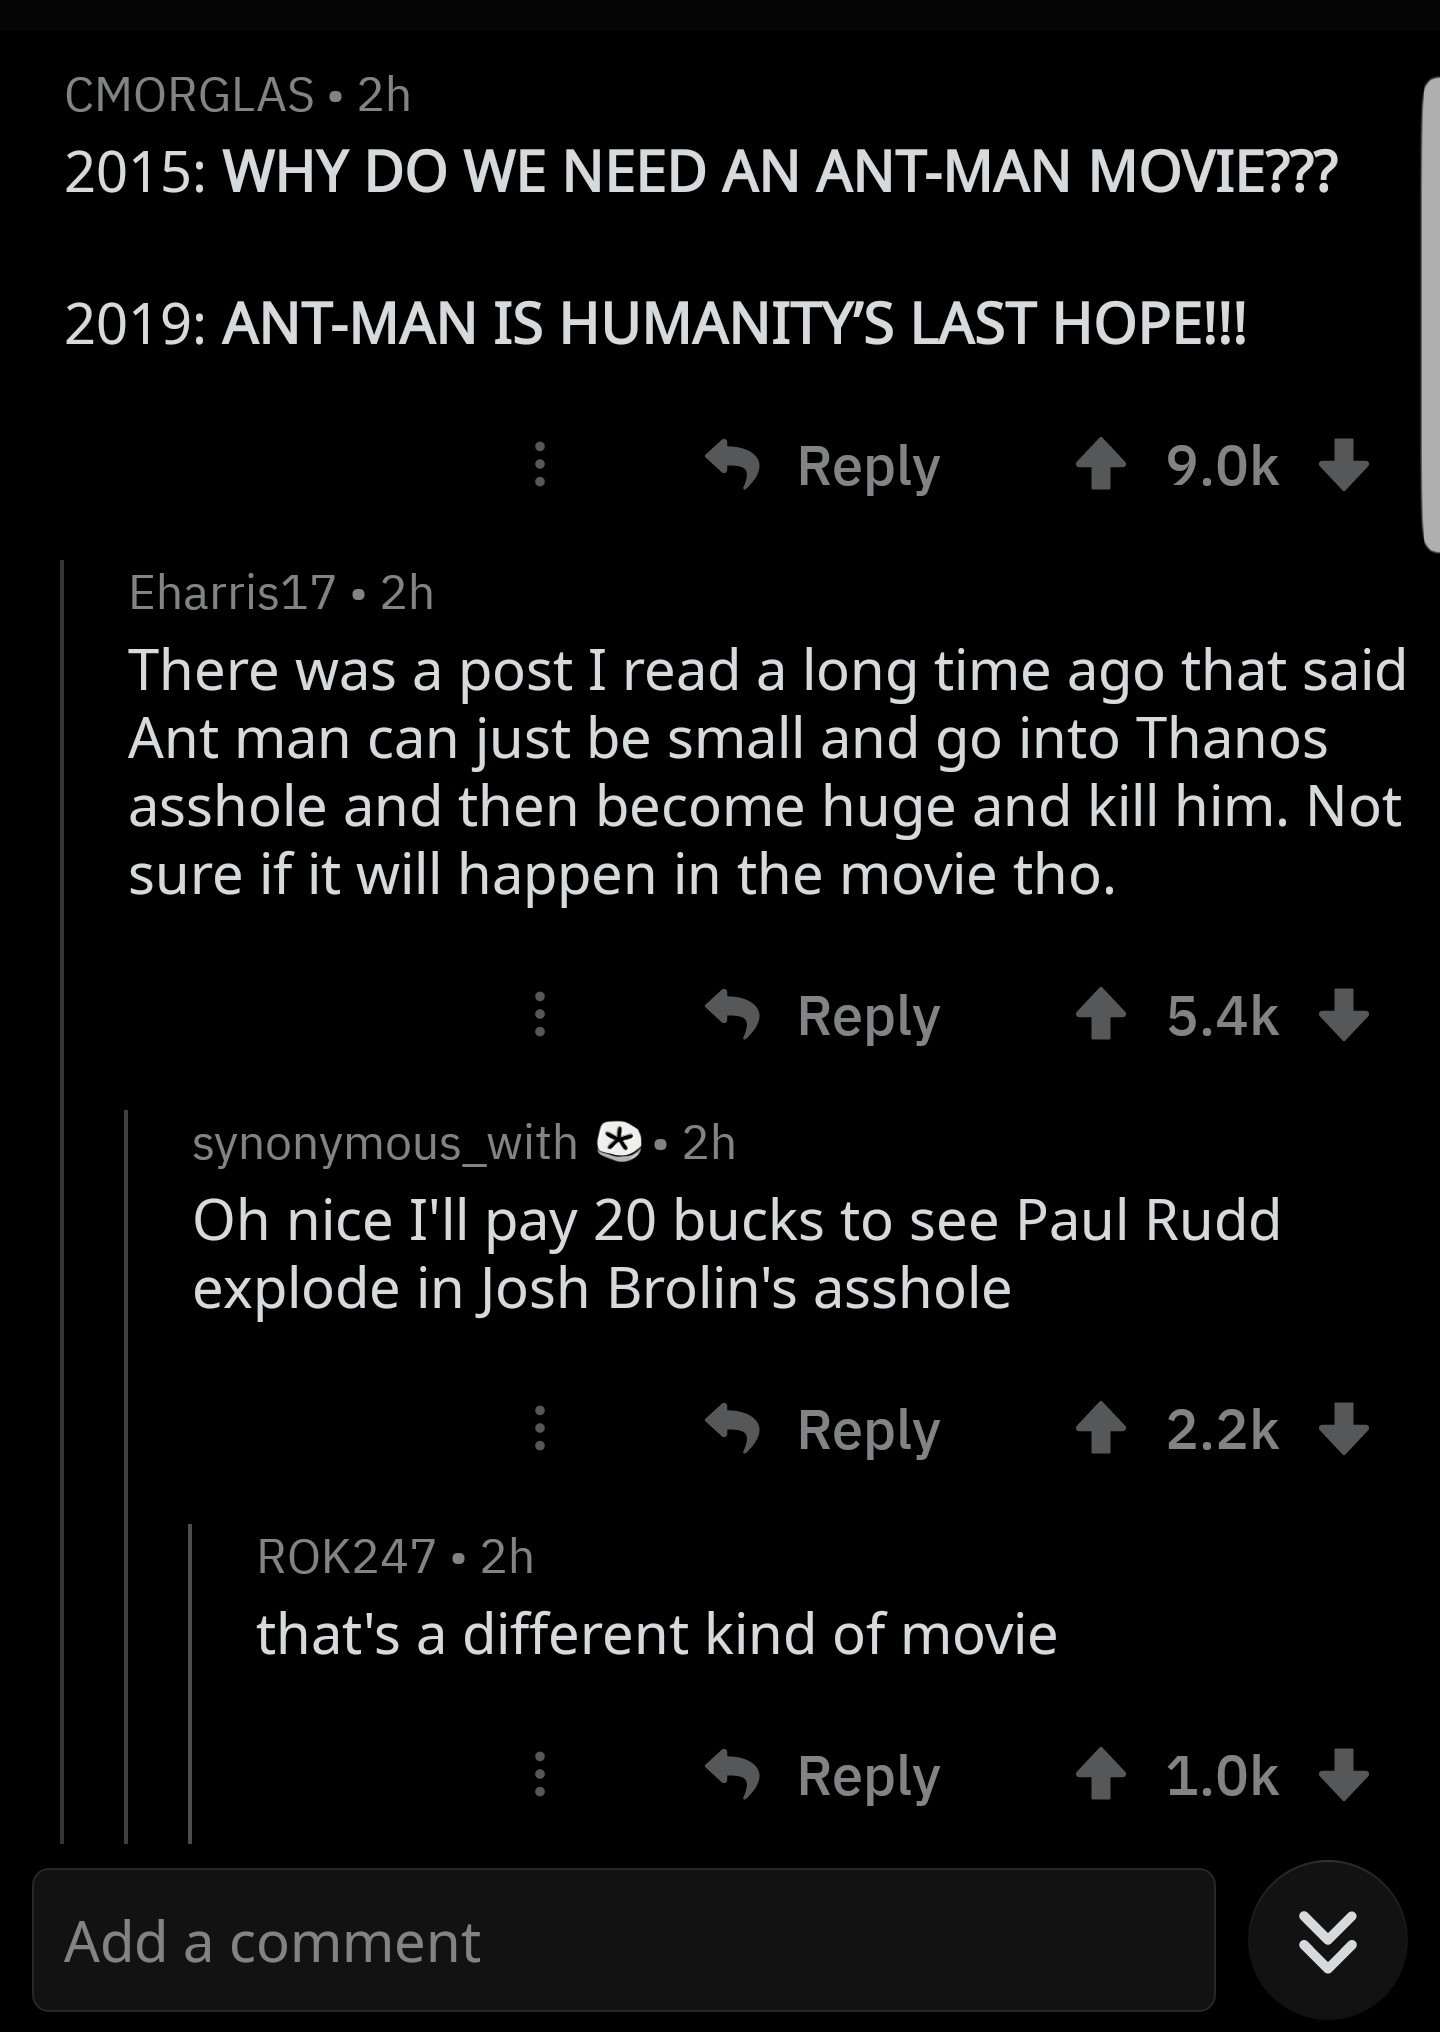 I'd pay too - meme